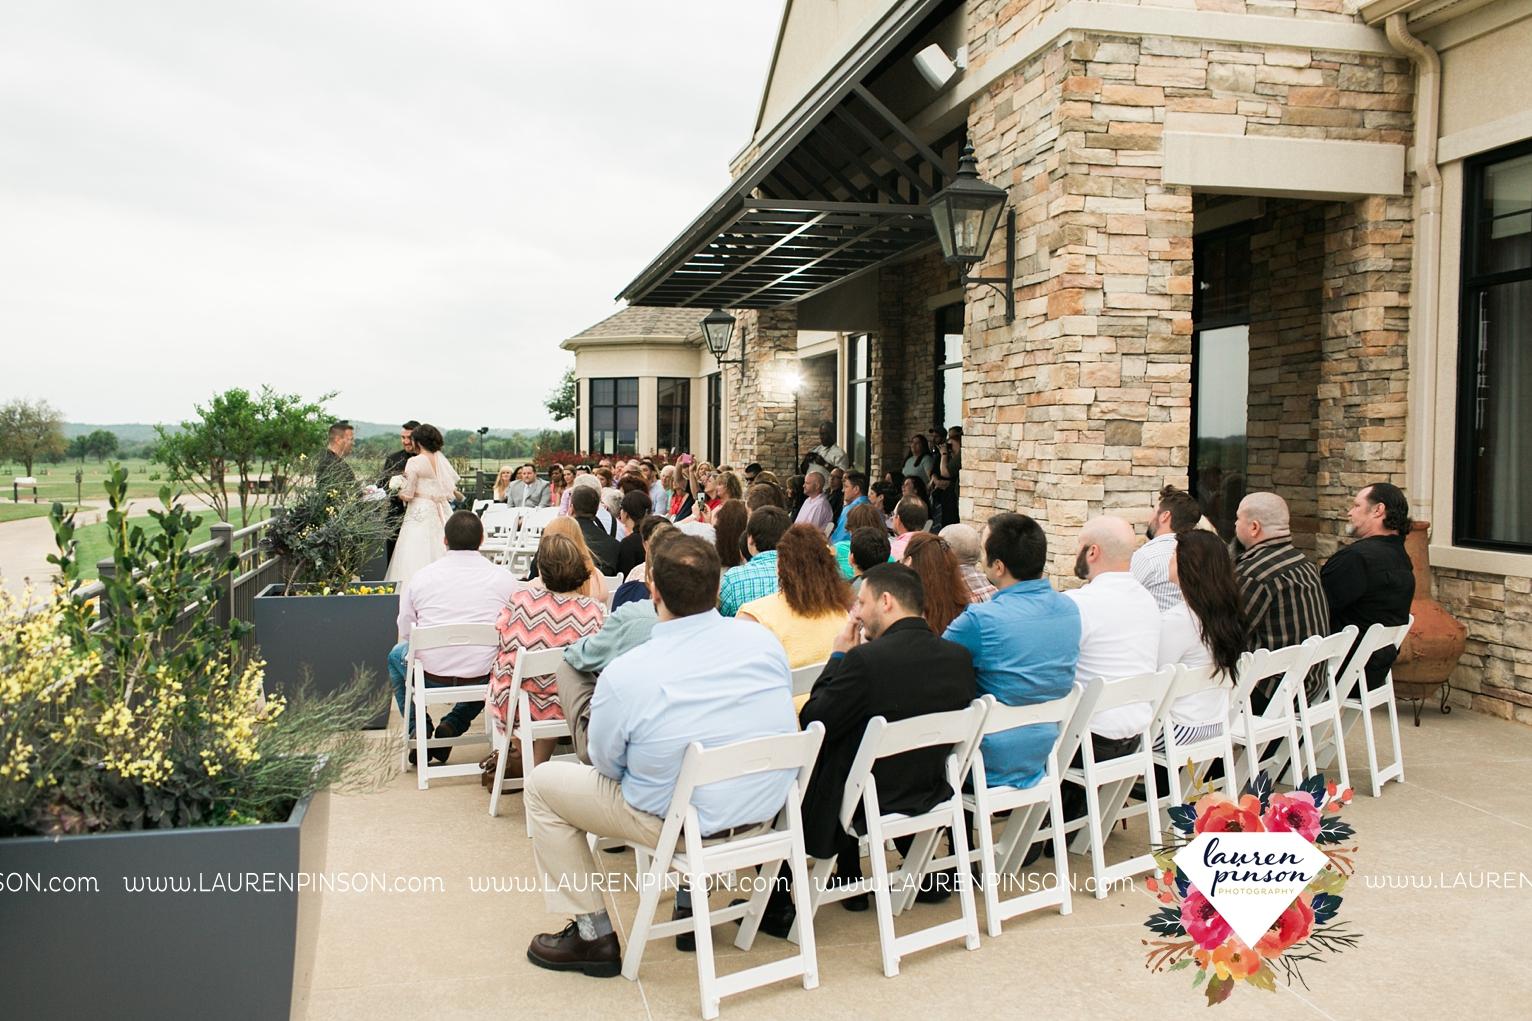 gainesville-texas-sherman-texas-thackerville-oklahoma-wedding-photographer-at-winstar-casino-golf-resort_2294.jpg